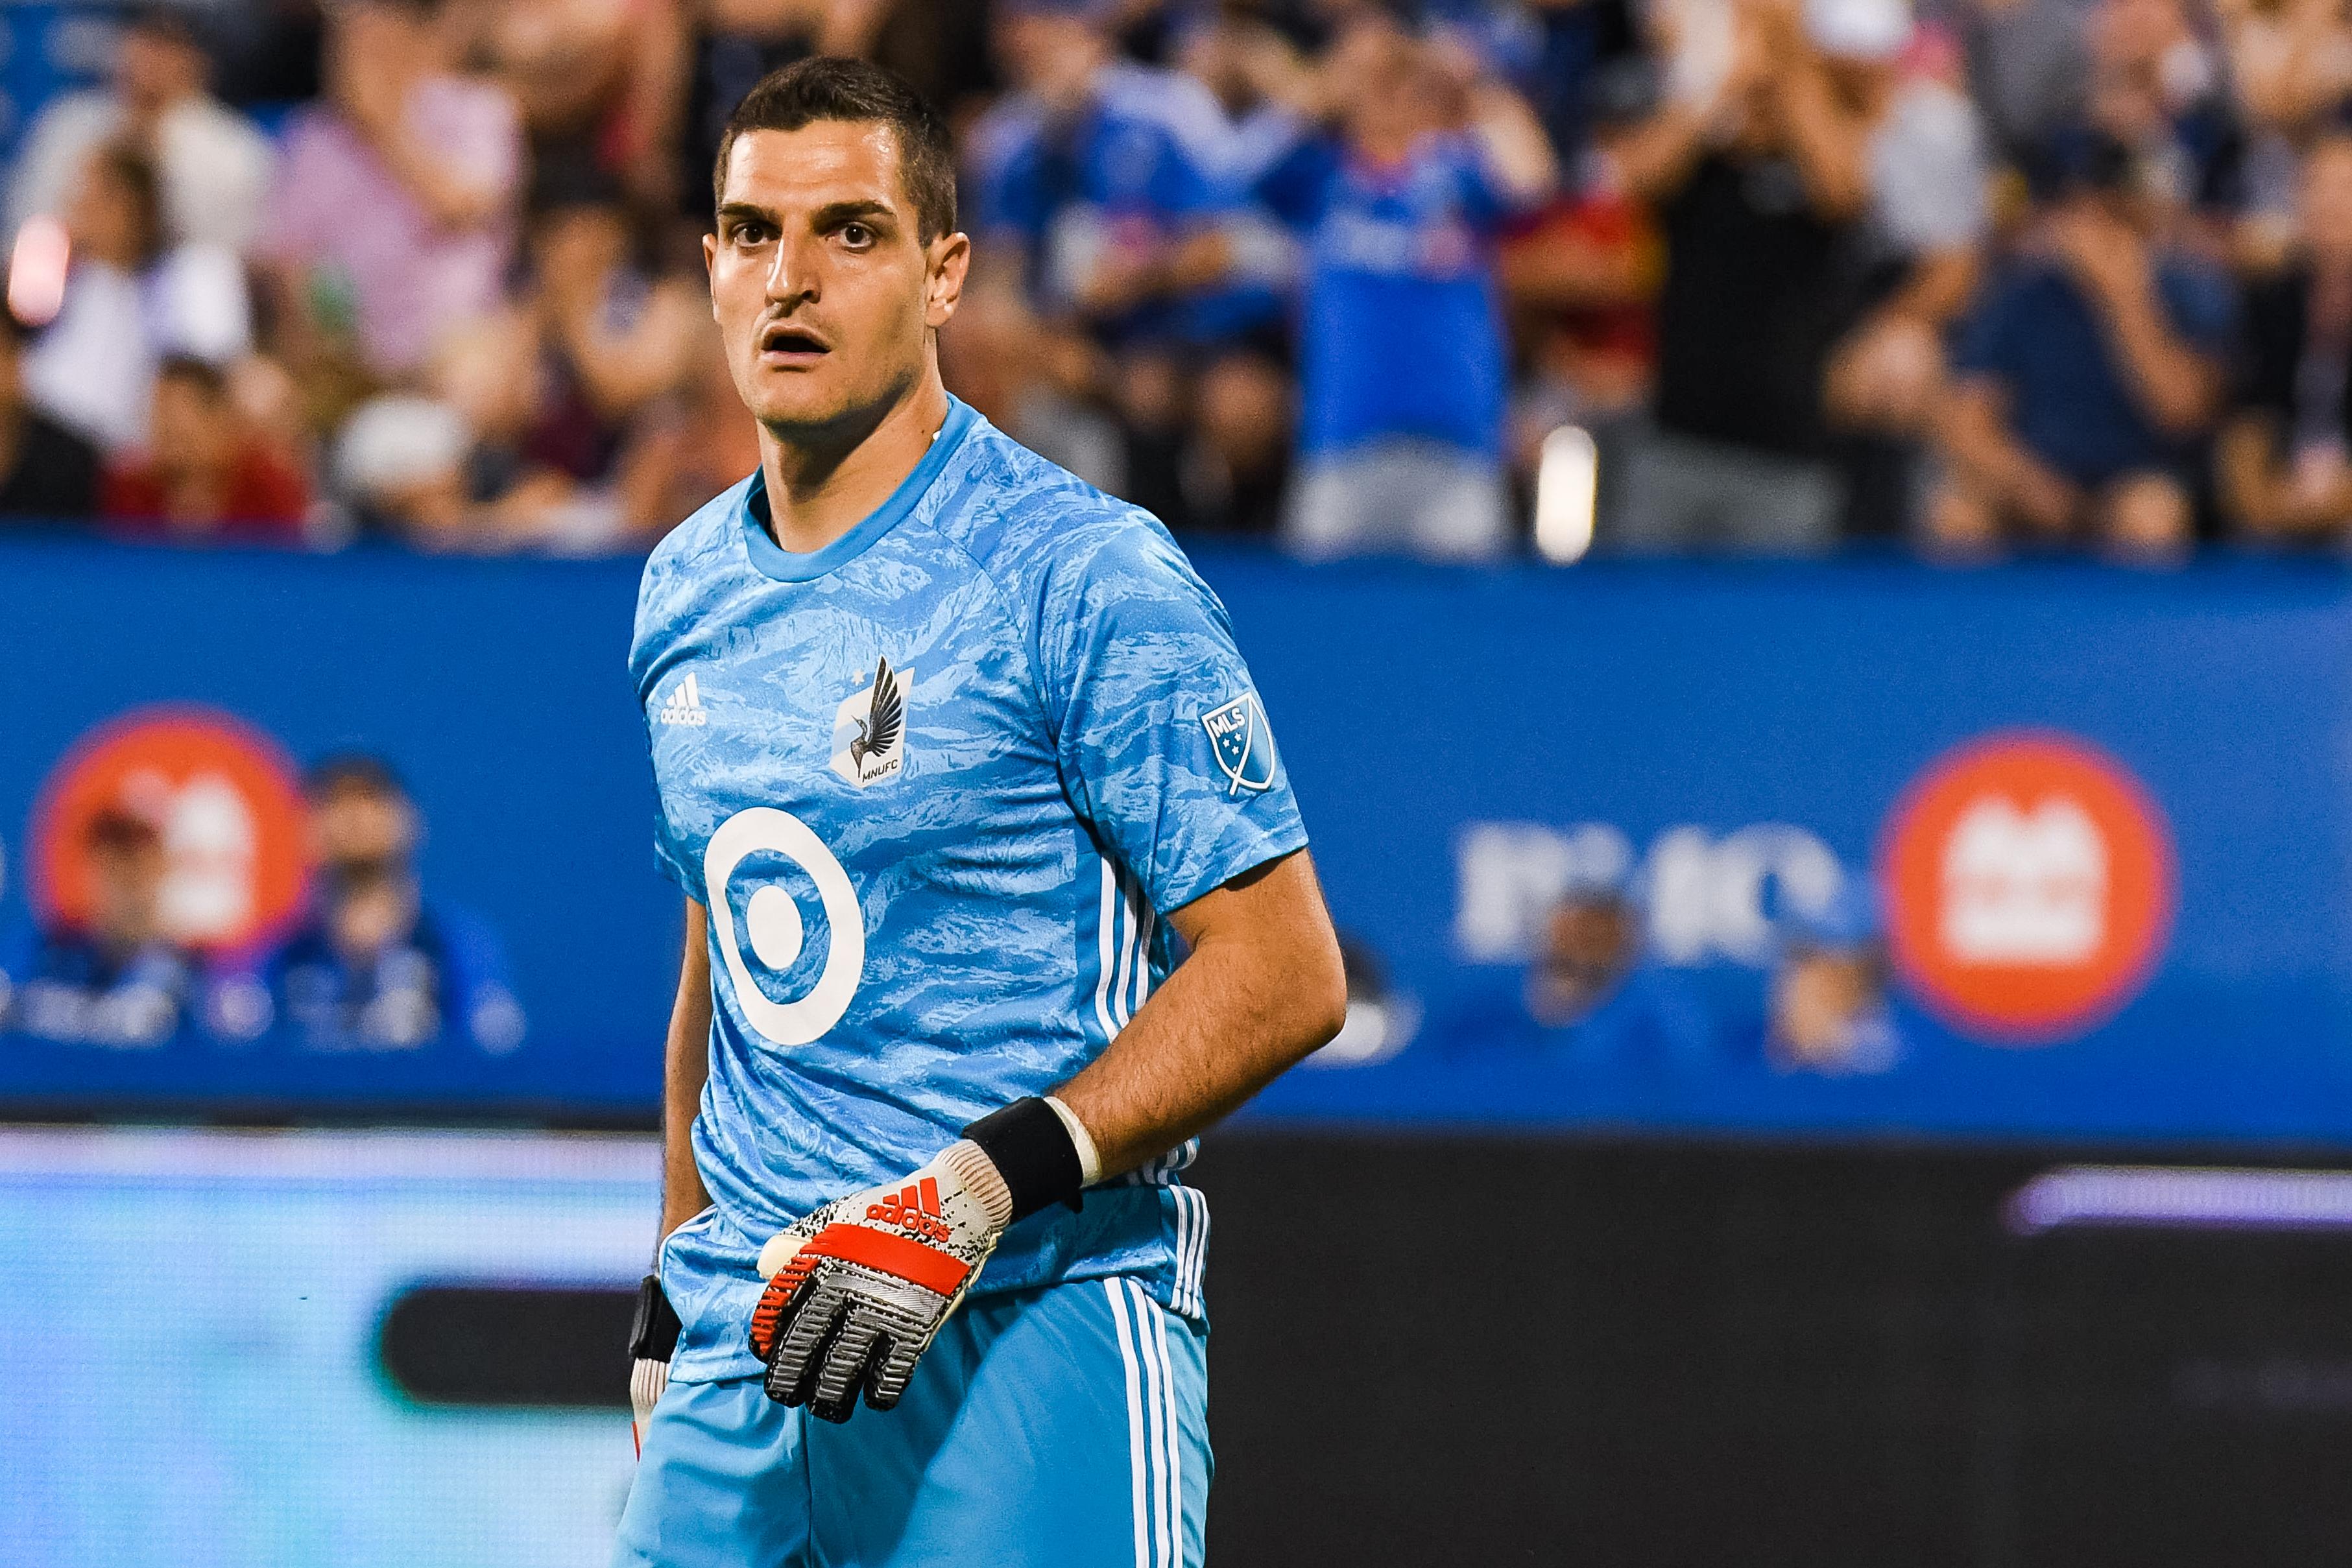 SOCCER: JUL 06 MLS - Minnesota United FC at Montreal Impact